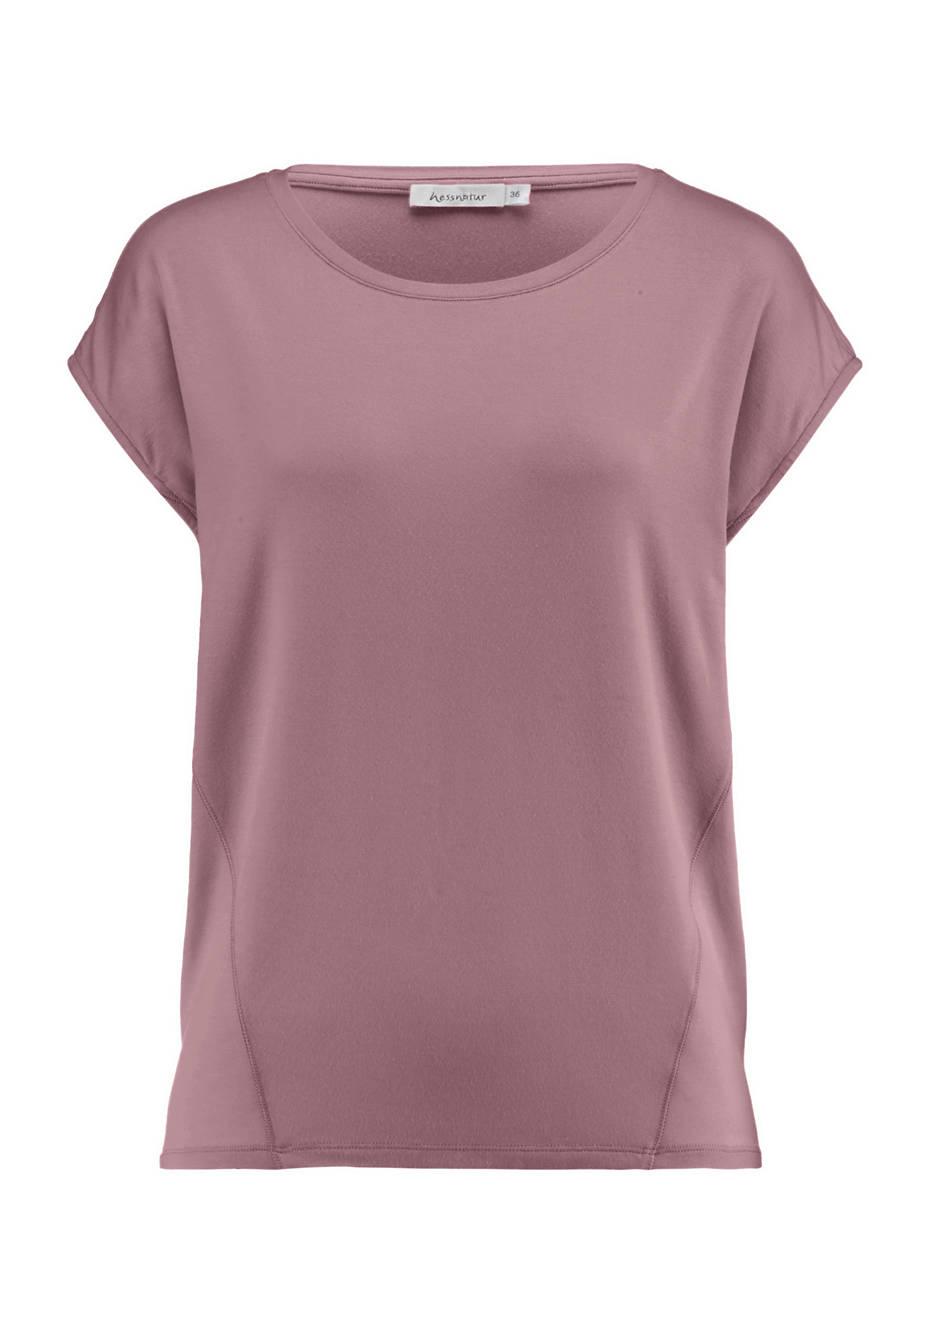 Yoga-Shirt aus Tencel™Modal